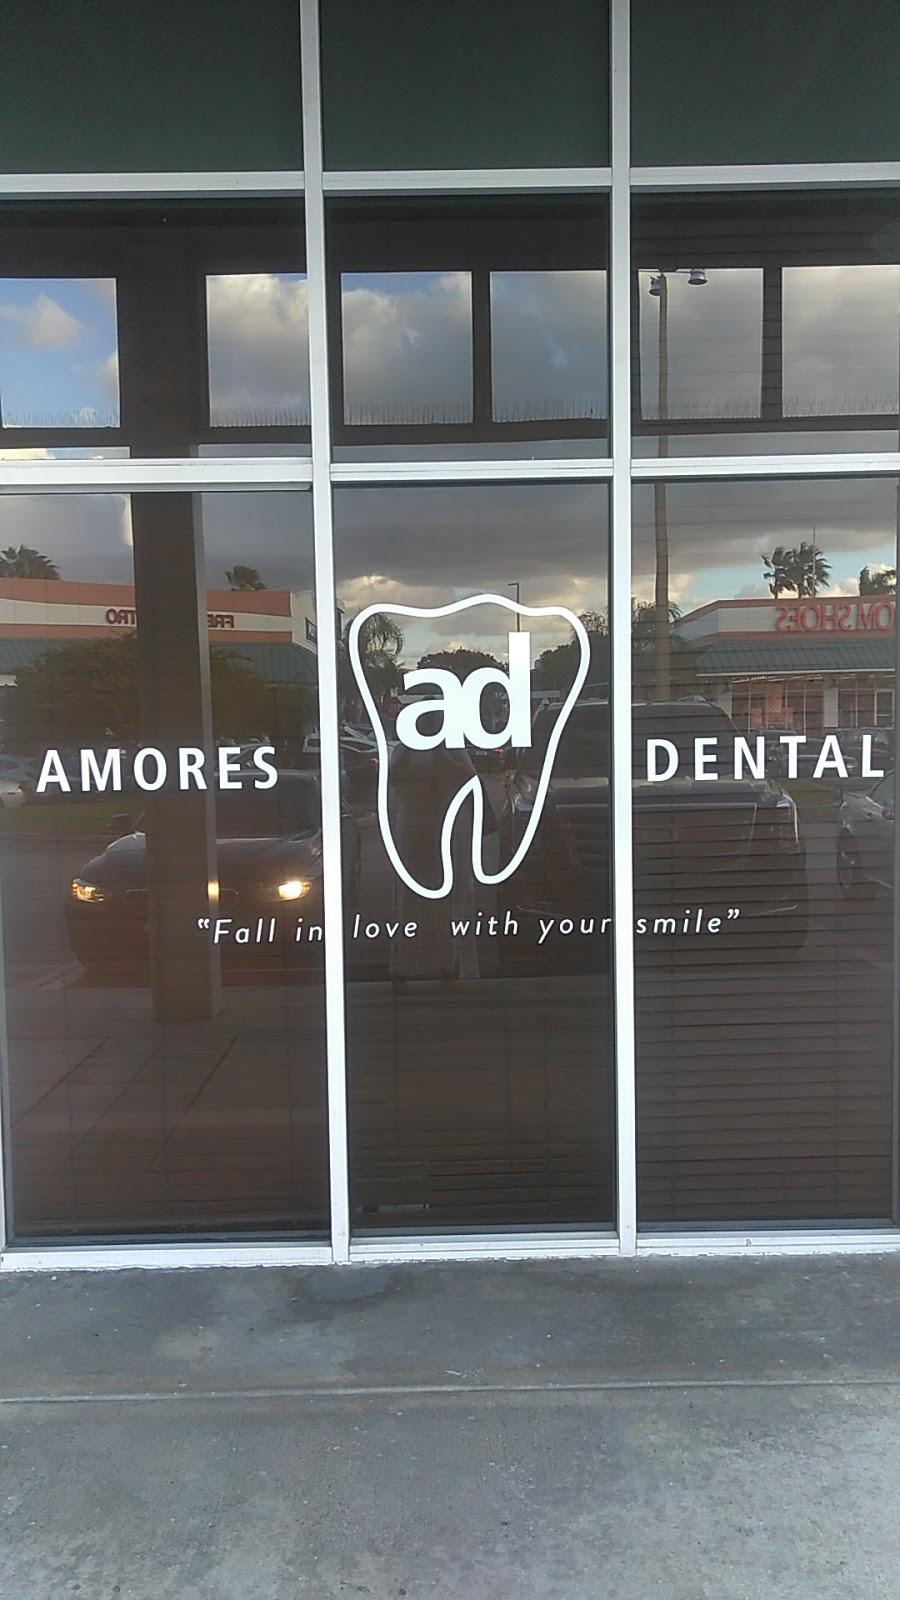 Amores Dental of Palmetto Bay - dentist    Photo 10 of 10   Address: 13617 S Dixie Hwy #126, Palmetto Bay, FL 33176, USA   Phone: (786) 579-9127